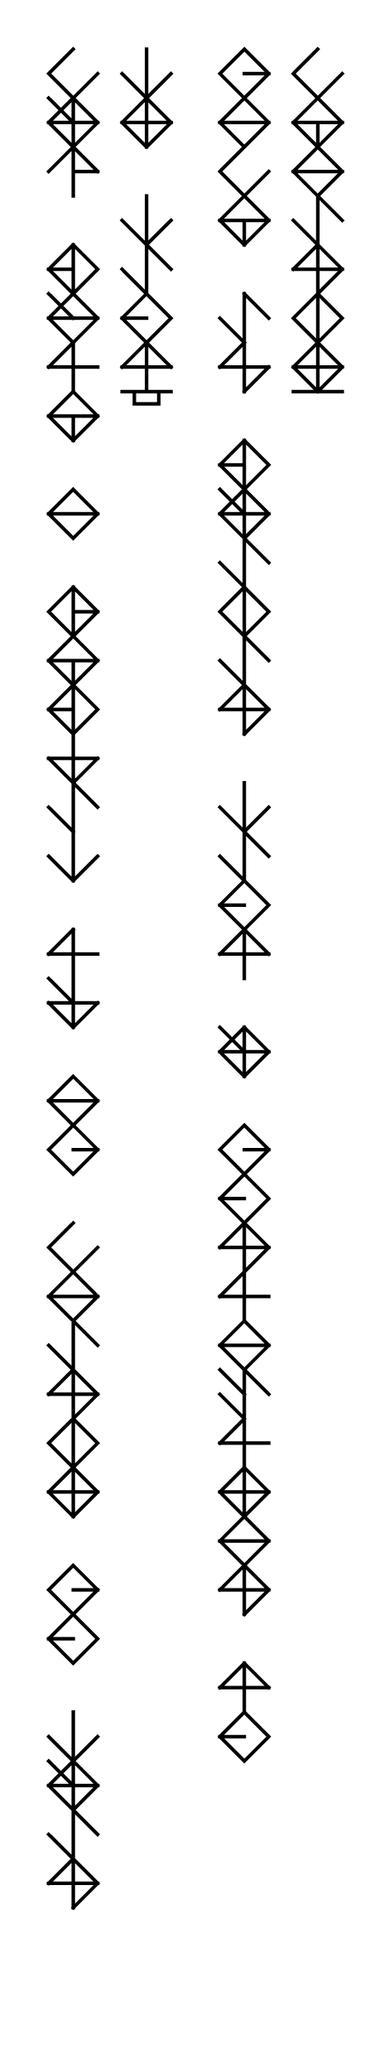 Third Code by foxgamer01